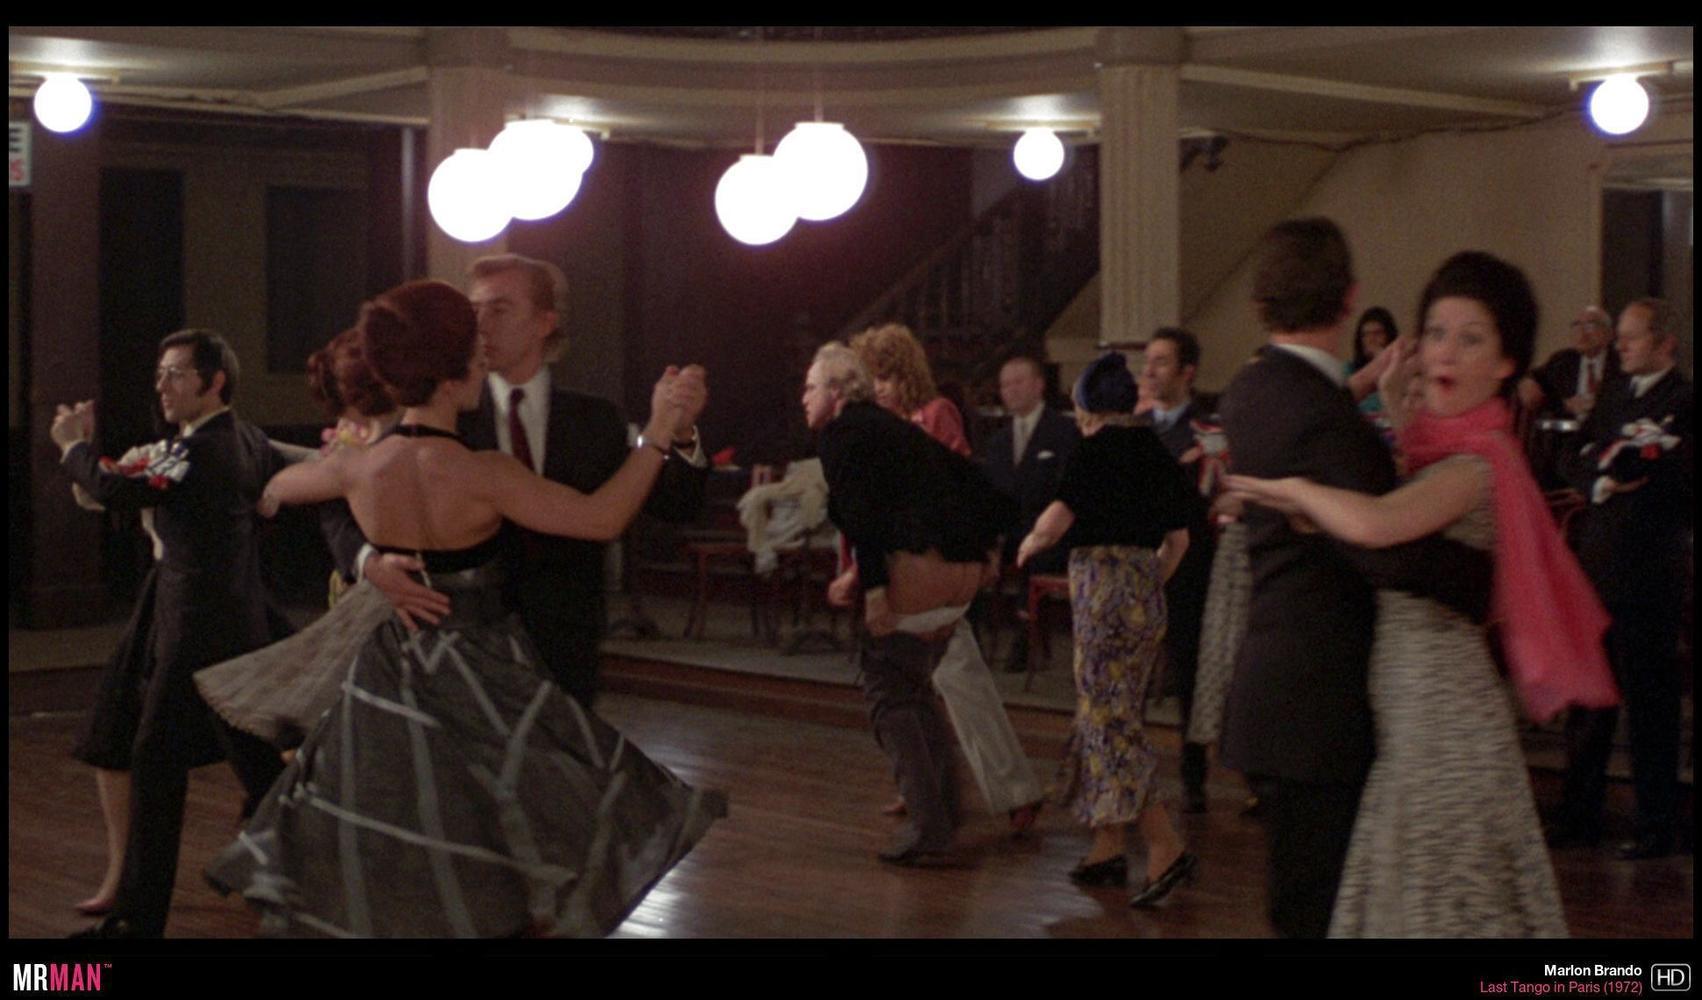 Brando last tango in paris 7c86f5a4 infobox web